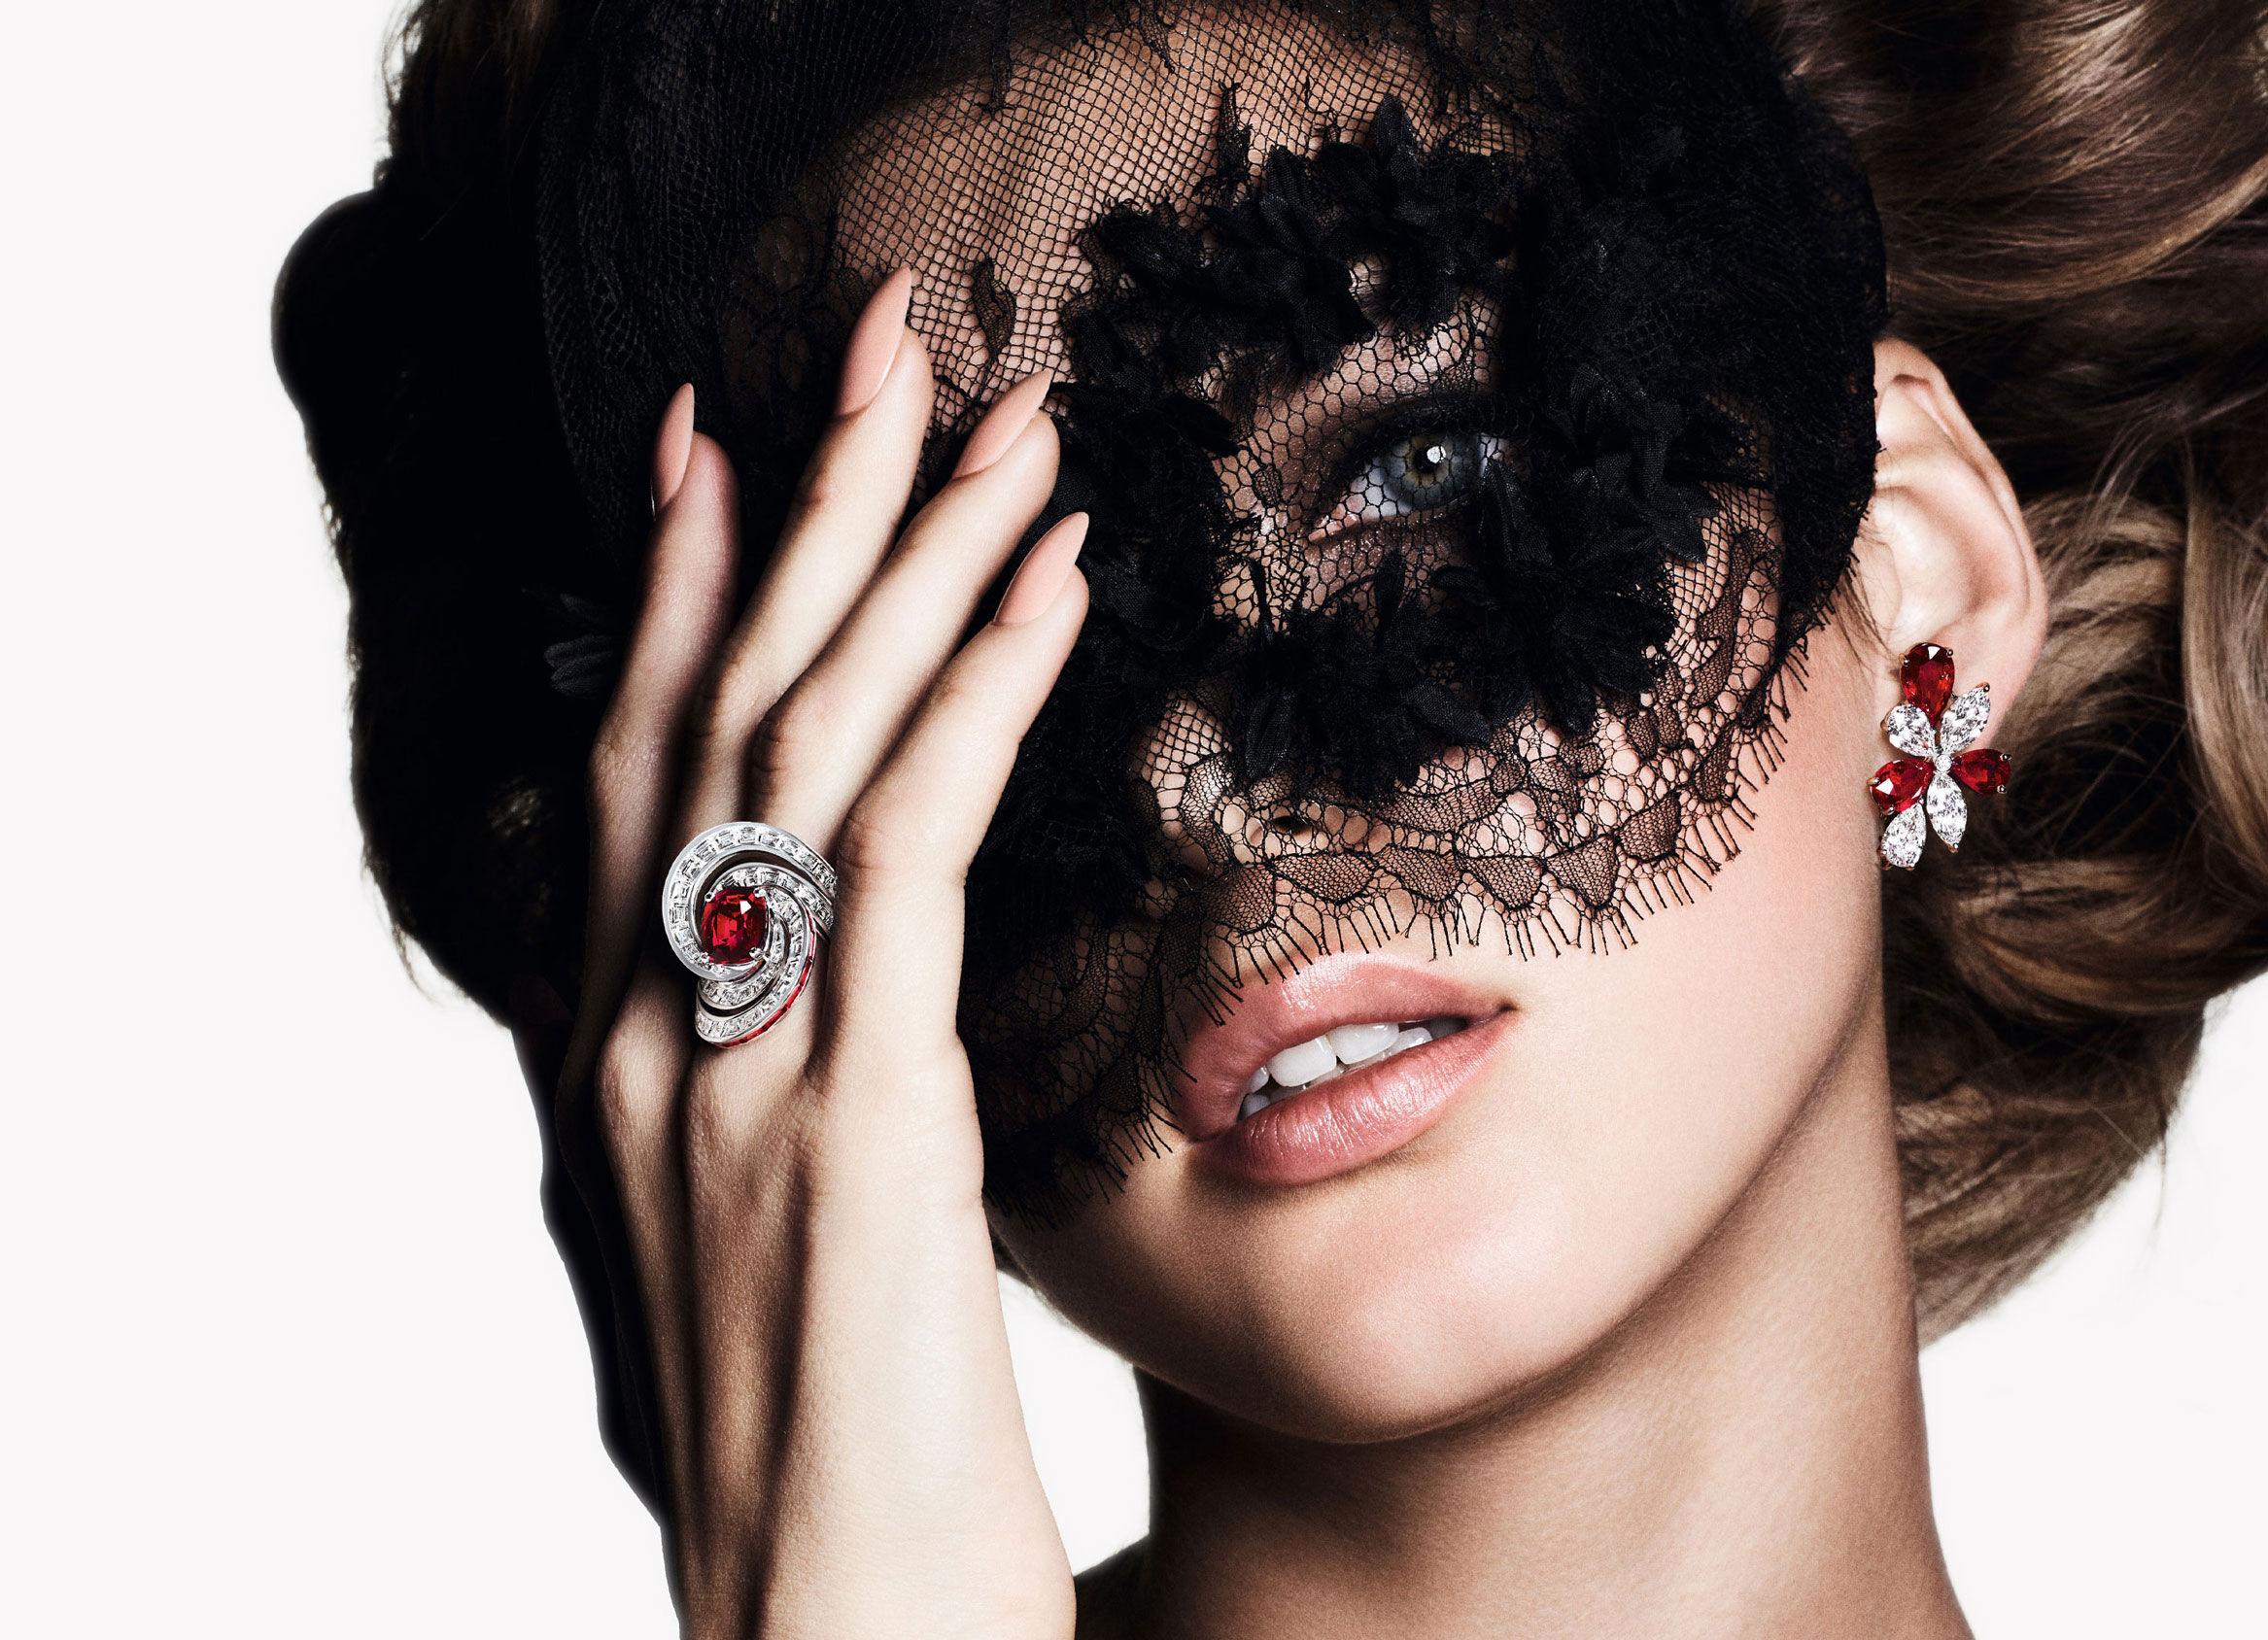 Model wears Graff ruby and white diamond high jewellery